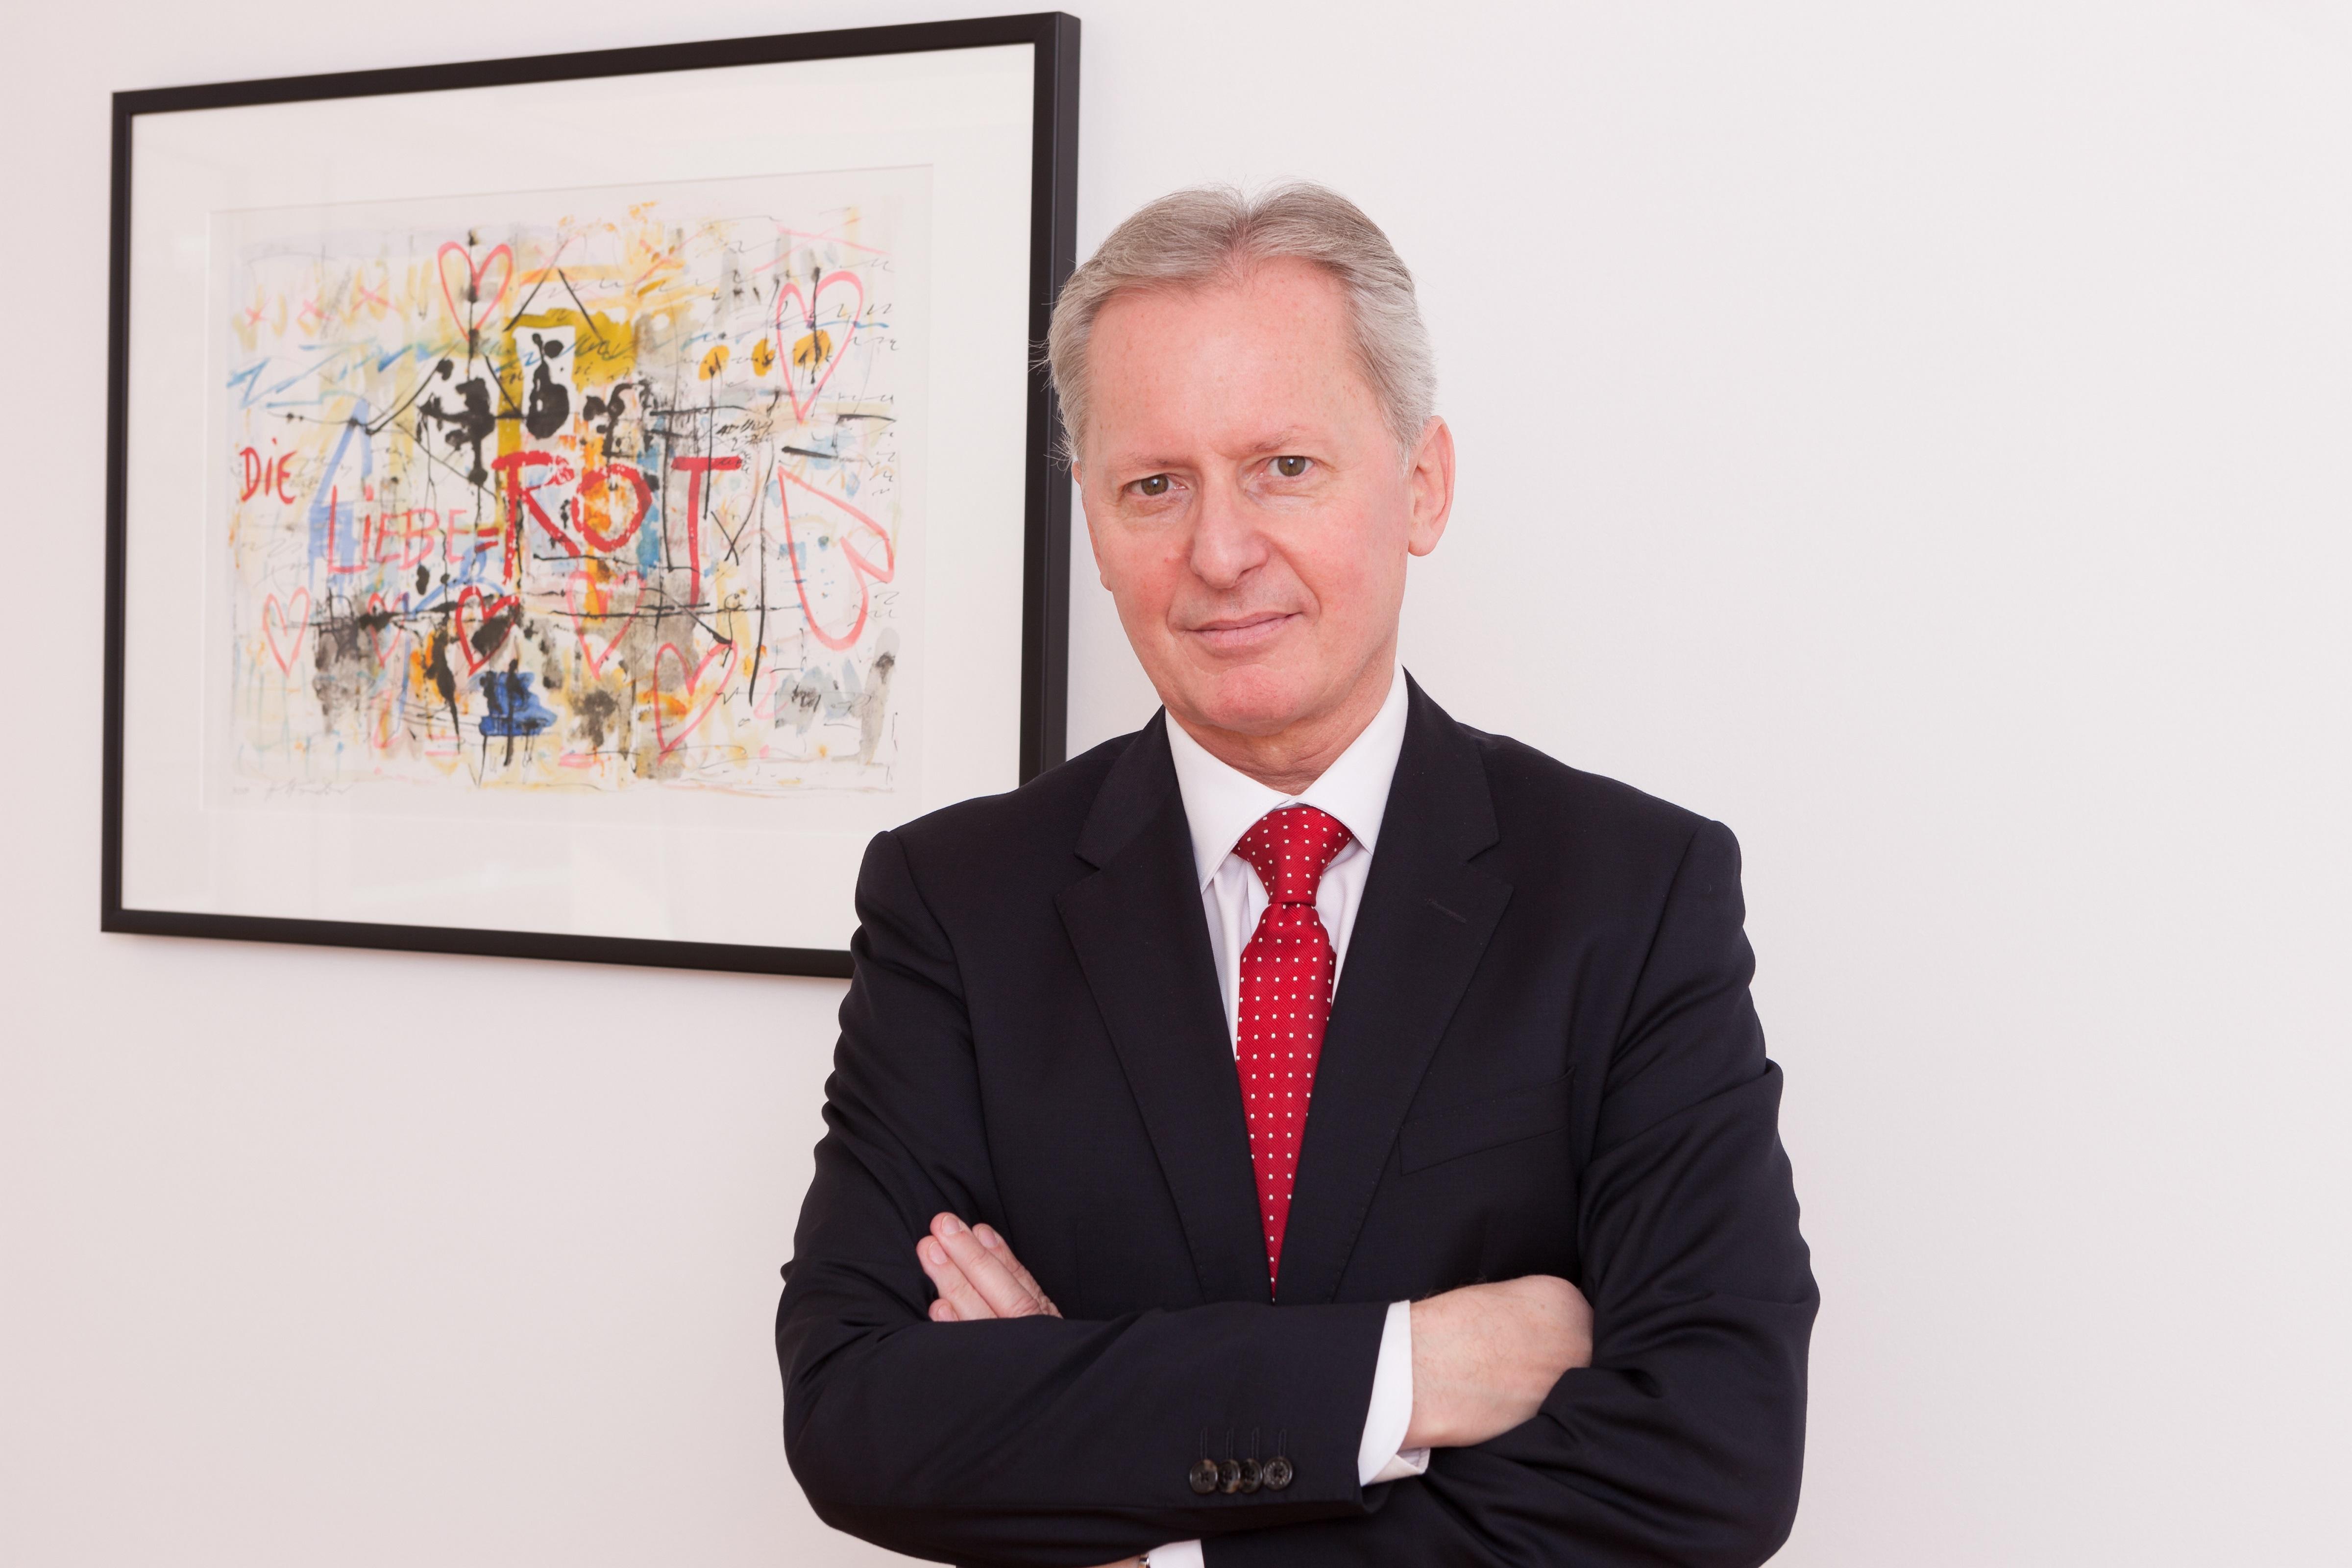 Dr. Michael Ruhdorfer